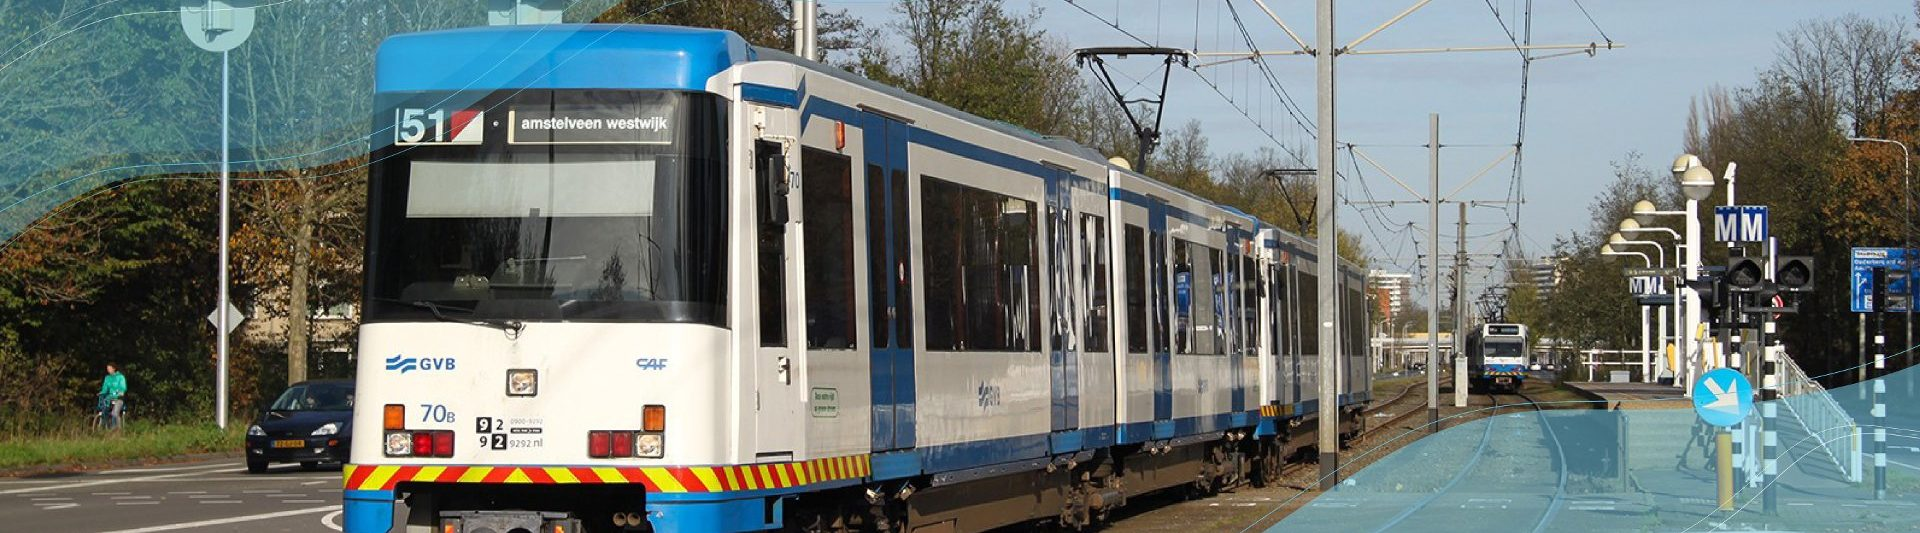 tram51